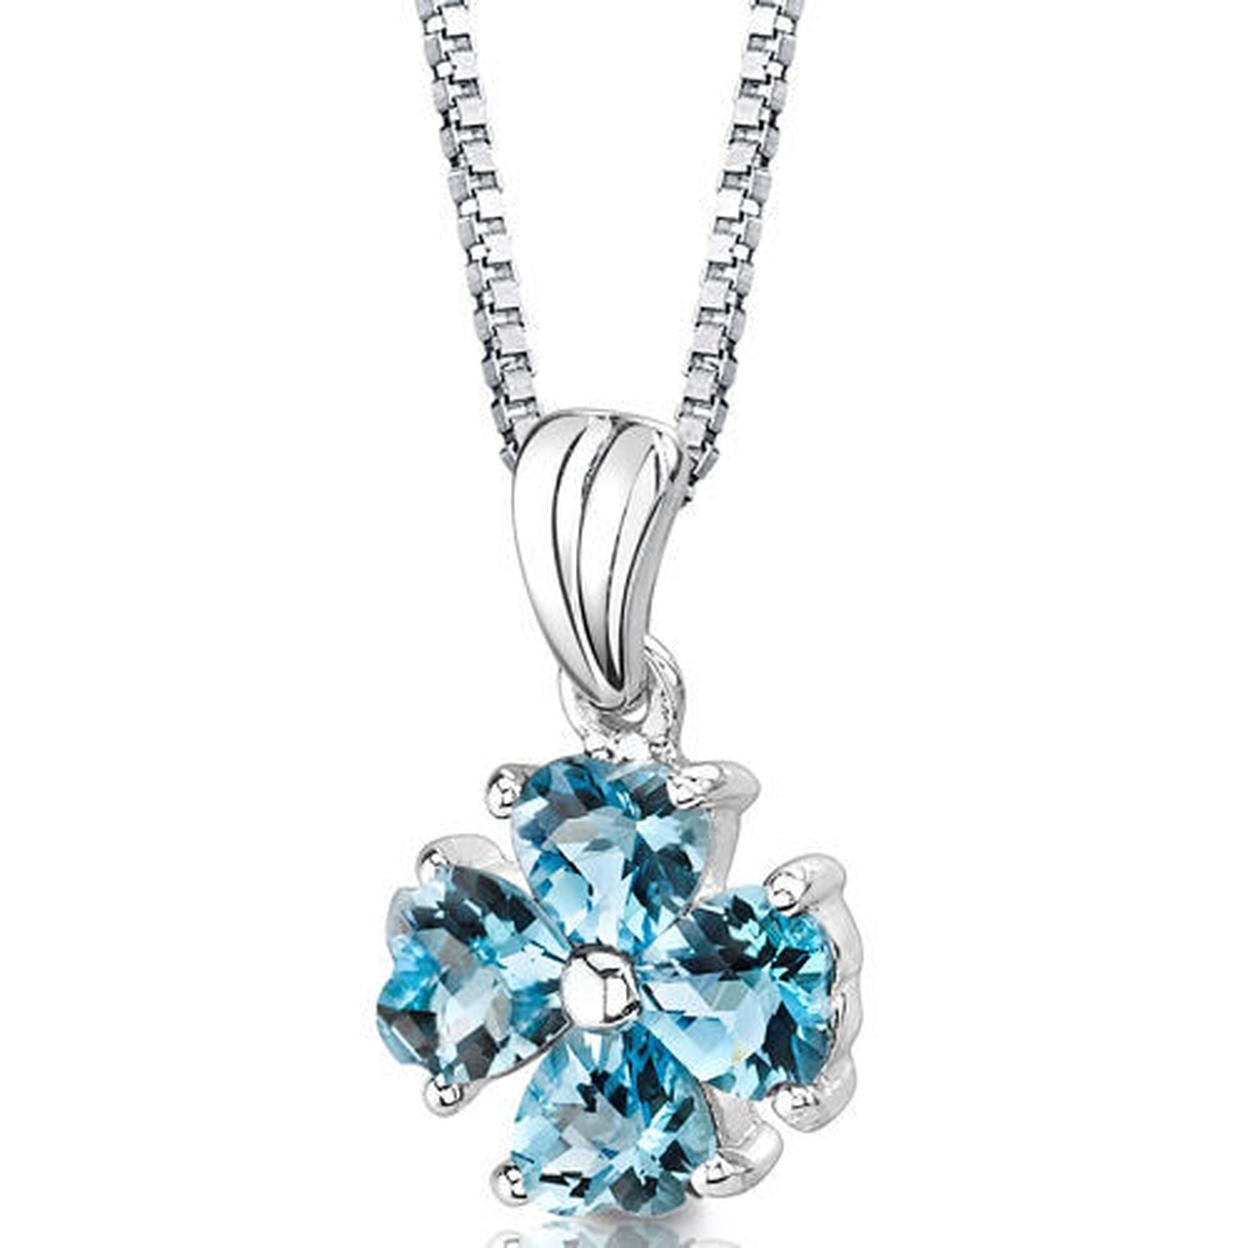 "Oravo 1.50 Carat T.g.w. Heart Cut Swiss Blue Topaz Rhodium Over Sterling Silver Pendant, 18\"""